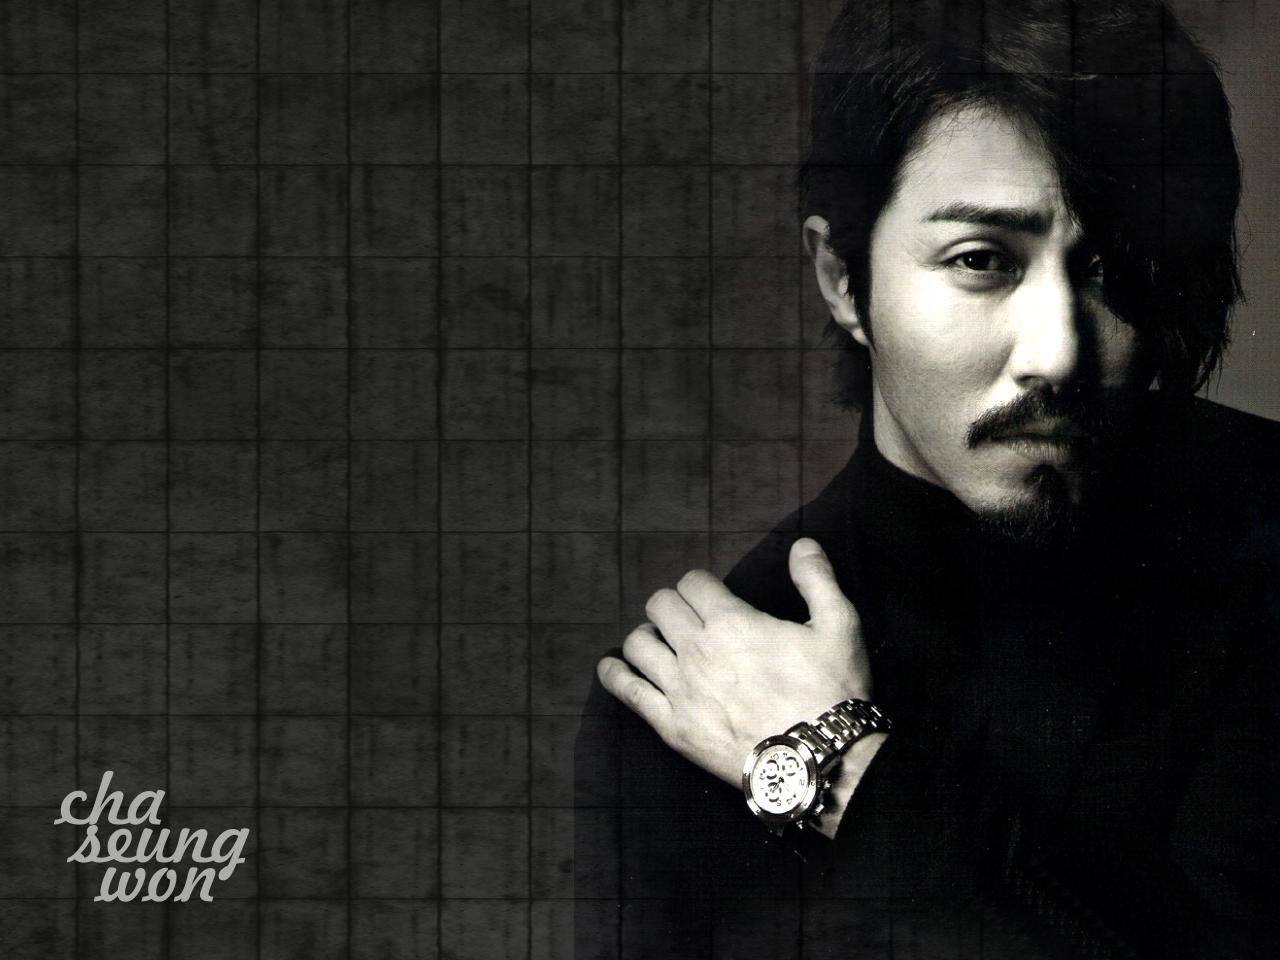 http://1.bp.blogspot.com/-MIBM5sdTWpk/UJzTUg9MP1I/AAAAAAAAATE/ePWH08aeDjI/s1600/wallpaper+cha+seung+won+3.jpg